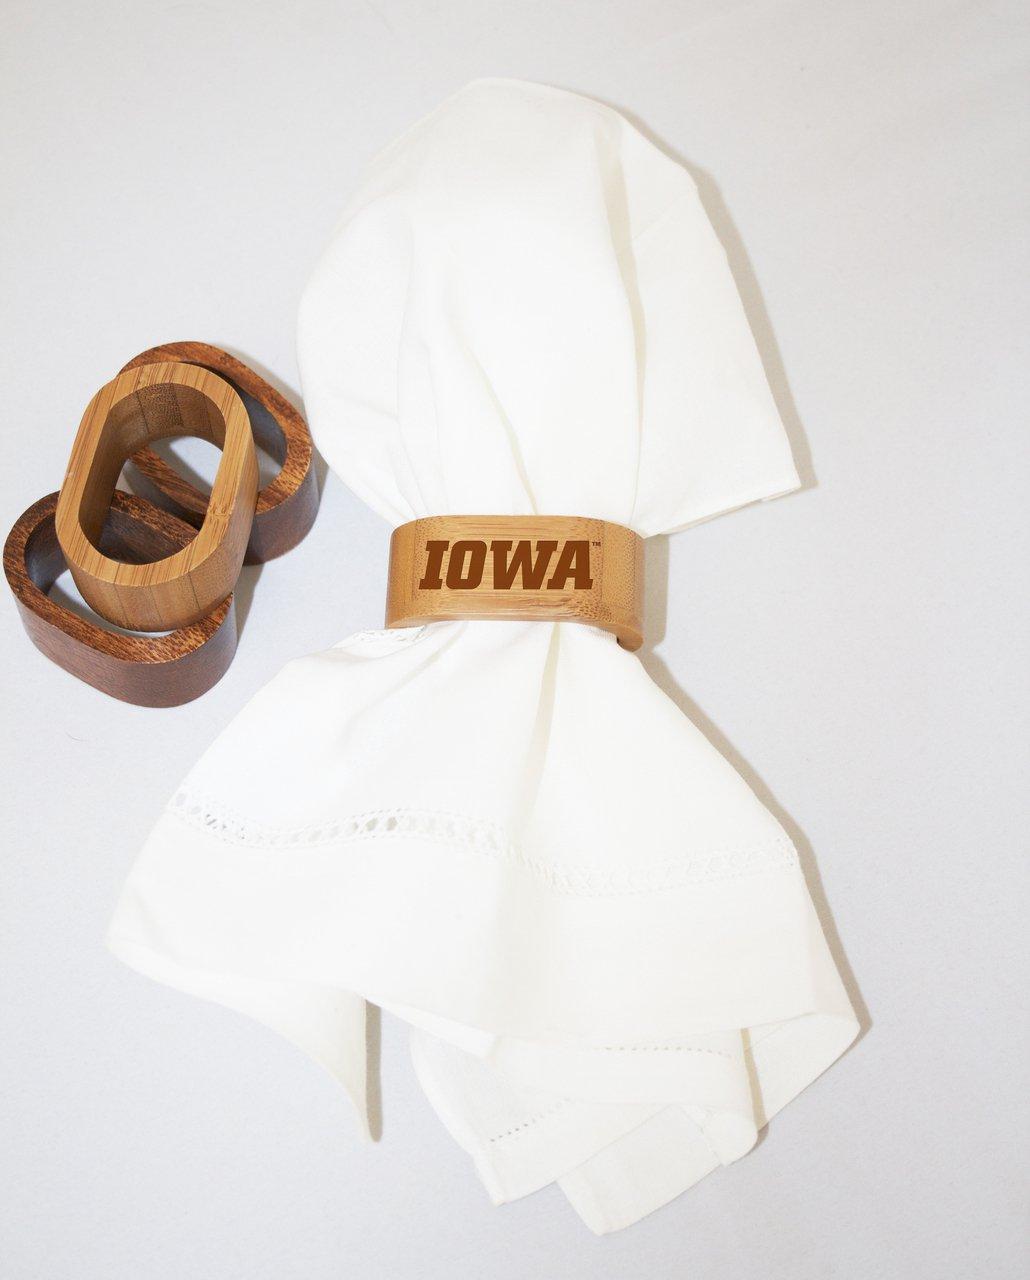 University of Iowa Napkin Rings by The College Artisan (Image #1)